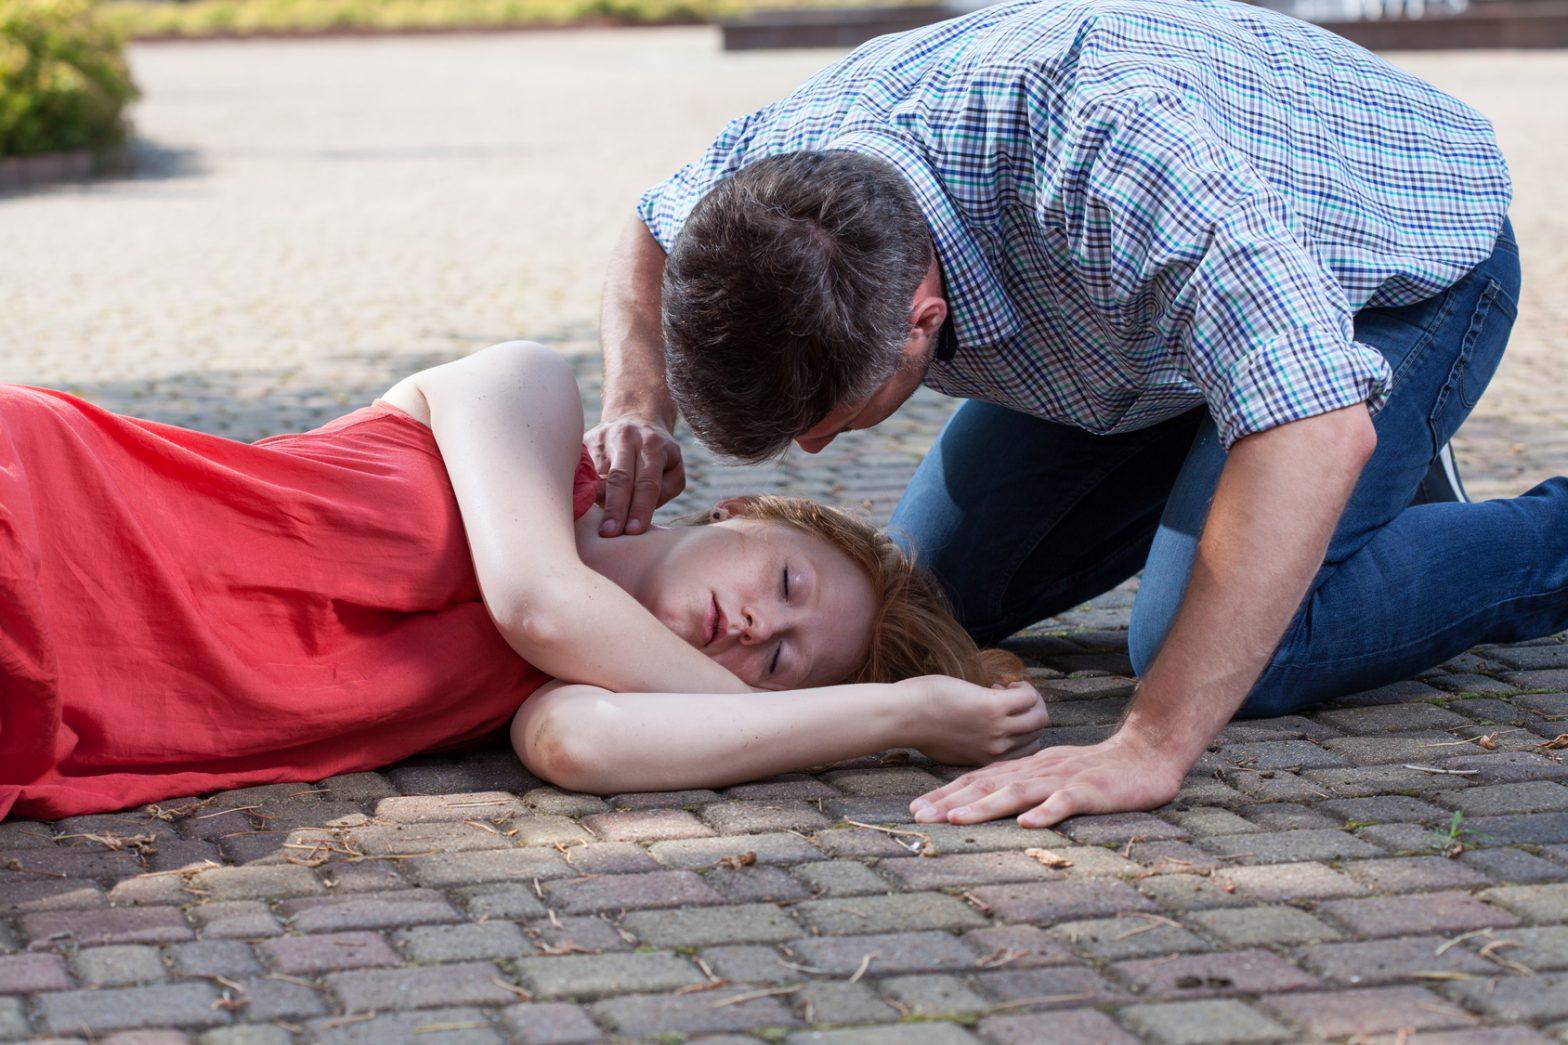 Omdlenie: jak pomóc choremu?